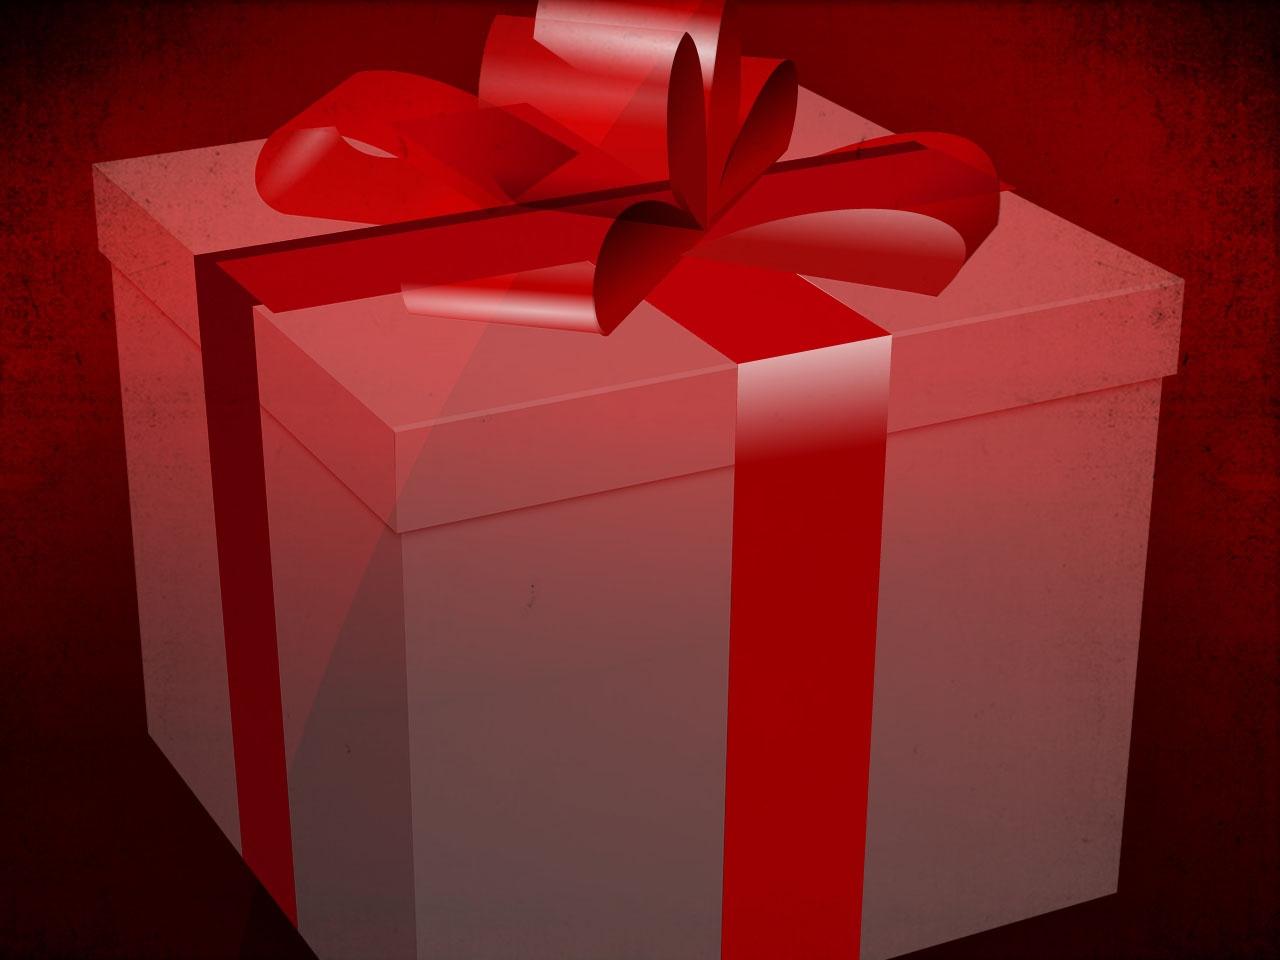 gift holiday_1543608575613.jpg.jpg